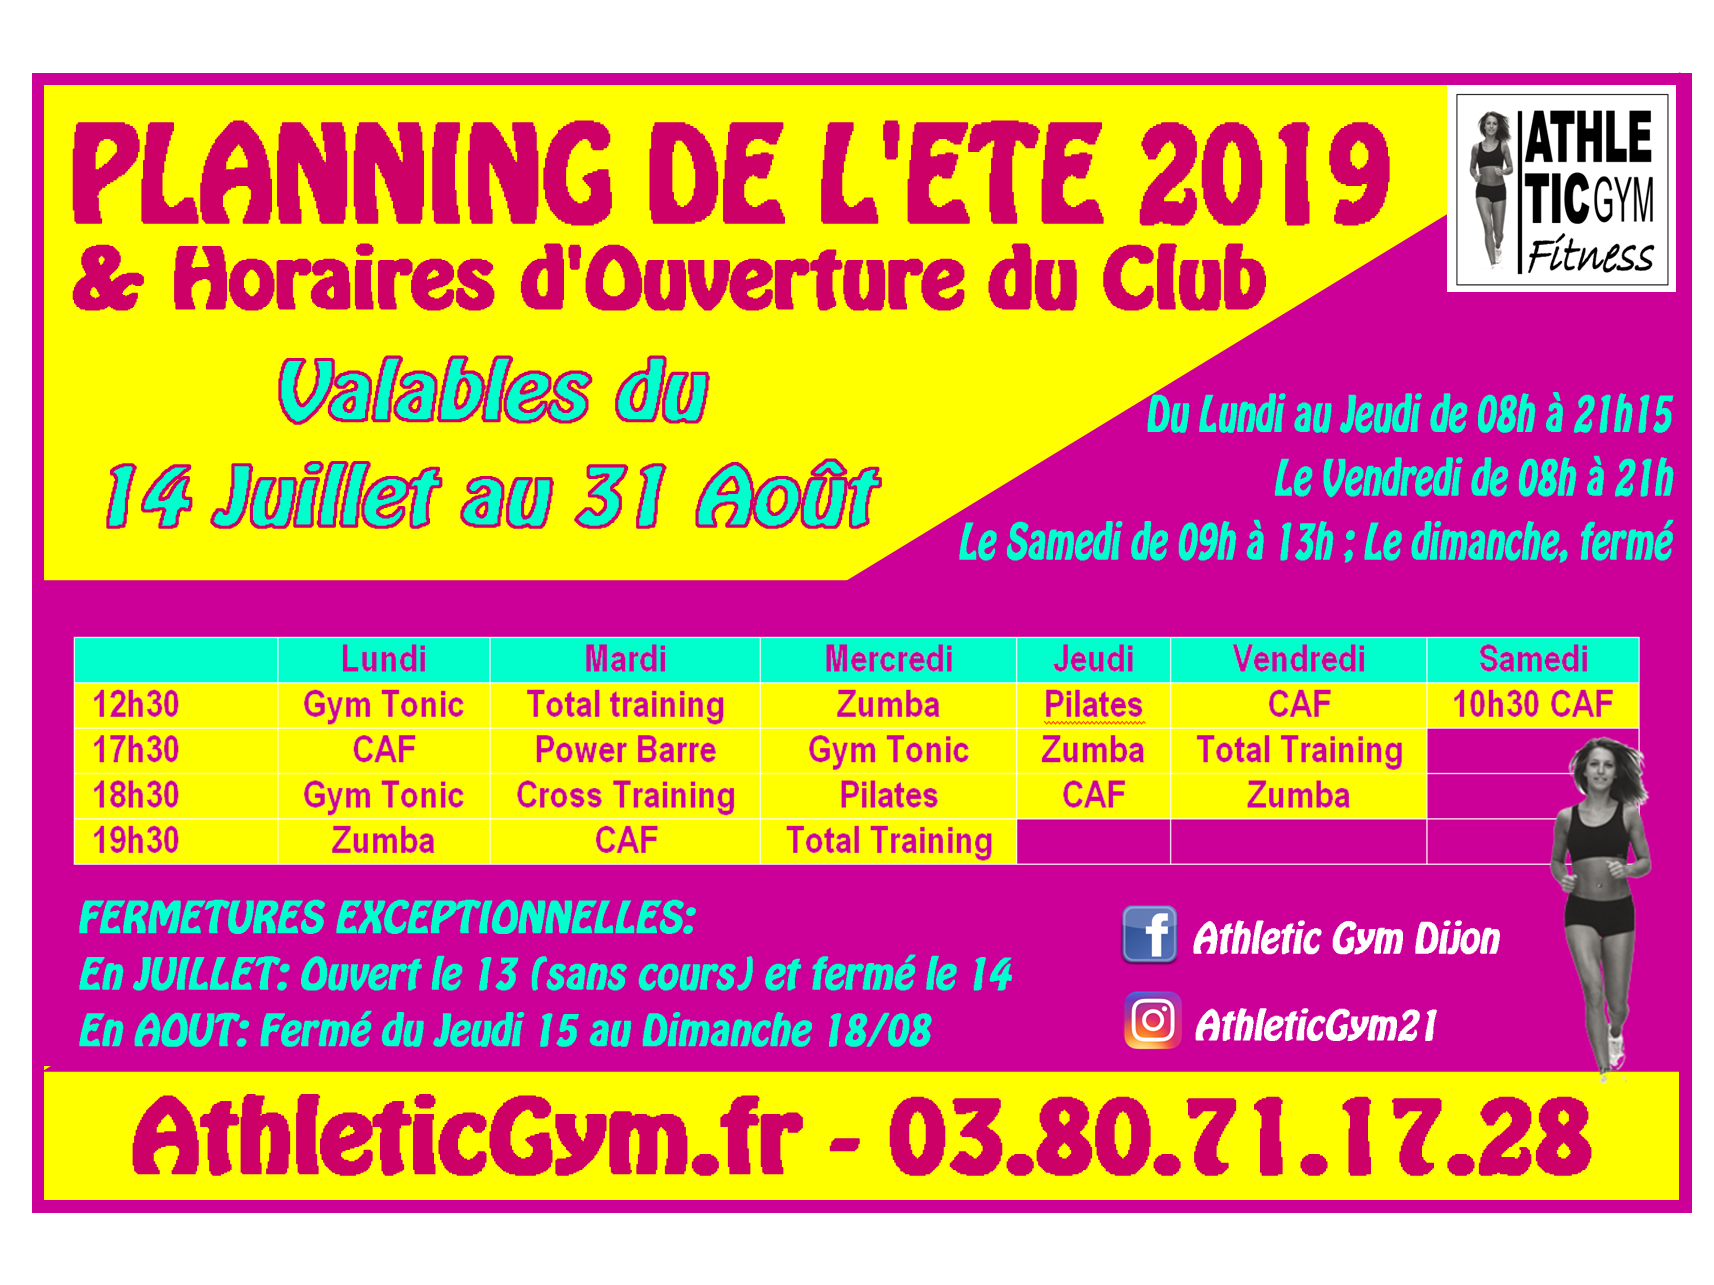 Athletic Gym Dijon-0